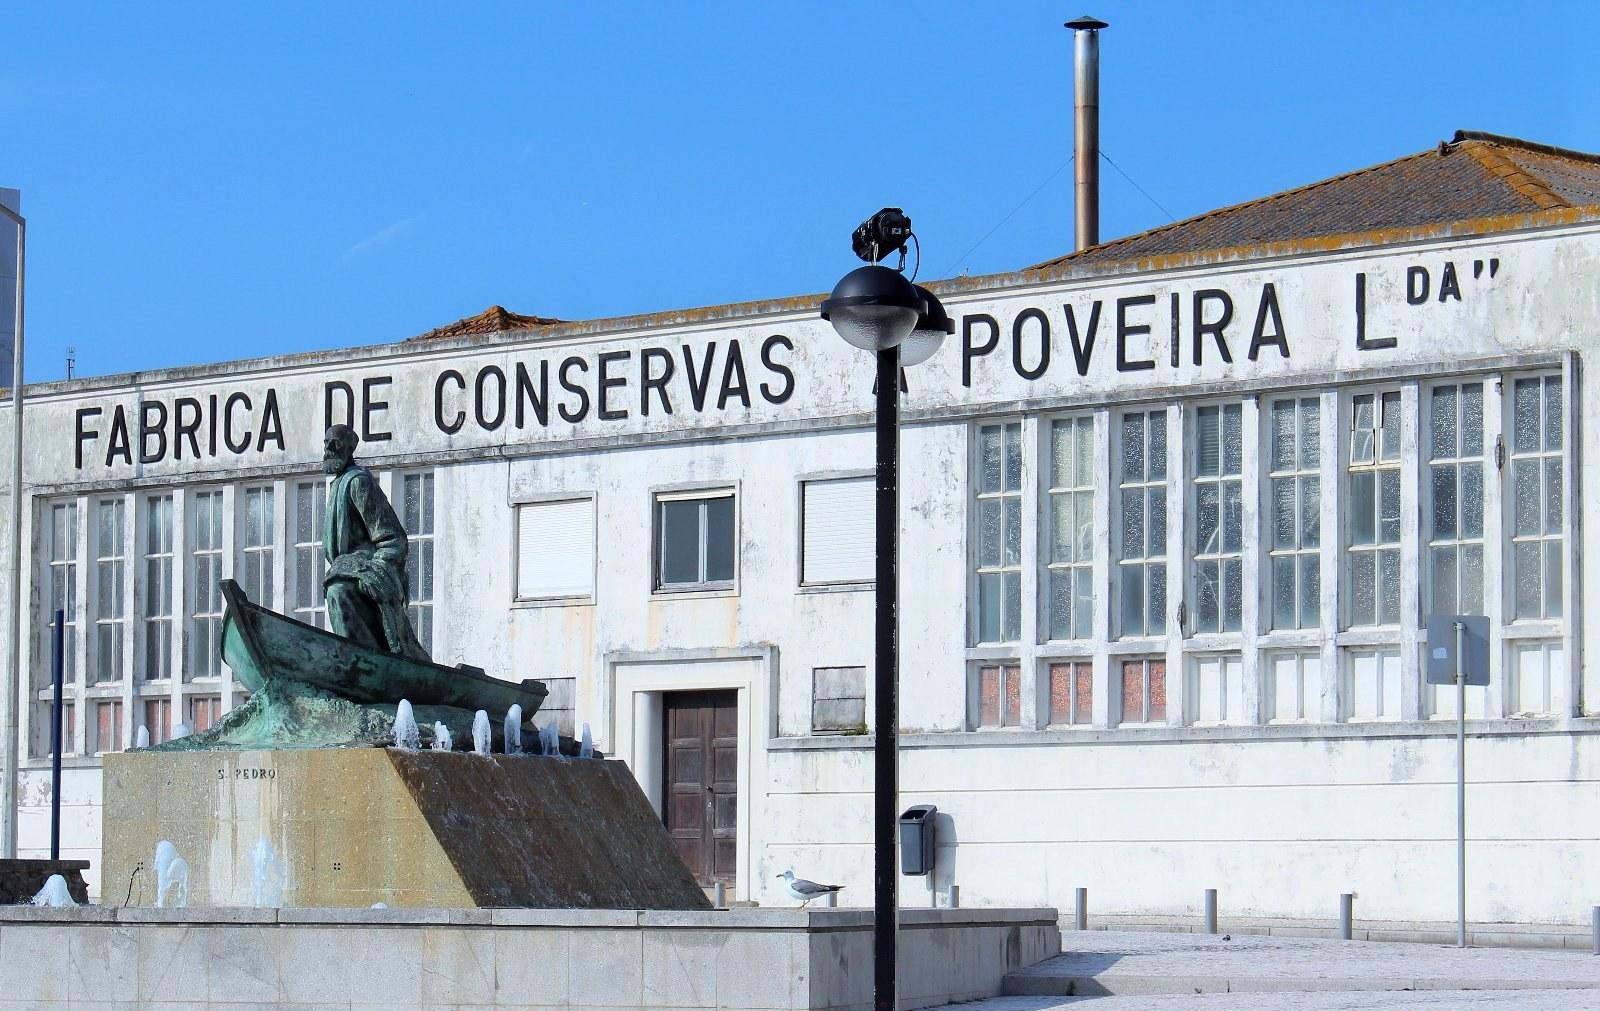 Повуа-ди-Варзин, Португалия: консервная фабрика, фото Стасмир, photo Stasmir